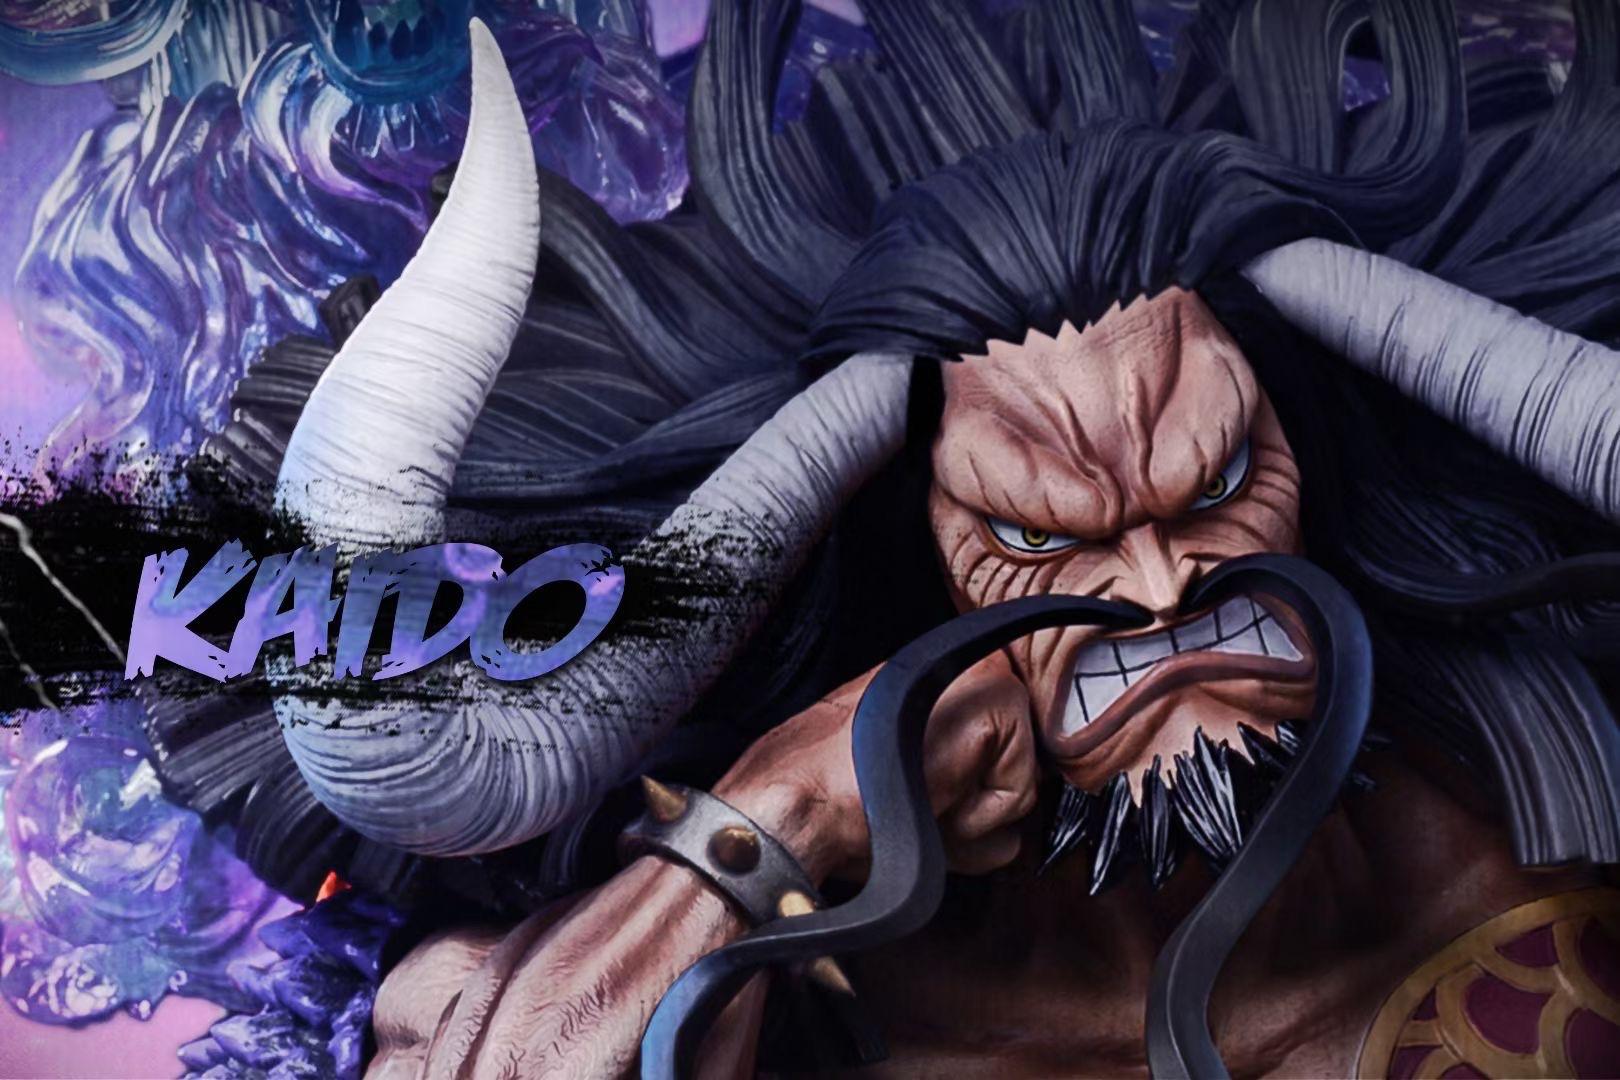 Kaido ไคโด ร้อยอสูร by G5 Studio (มัดจำ)